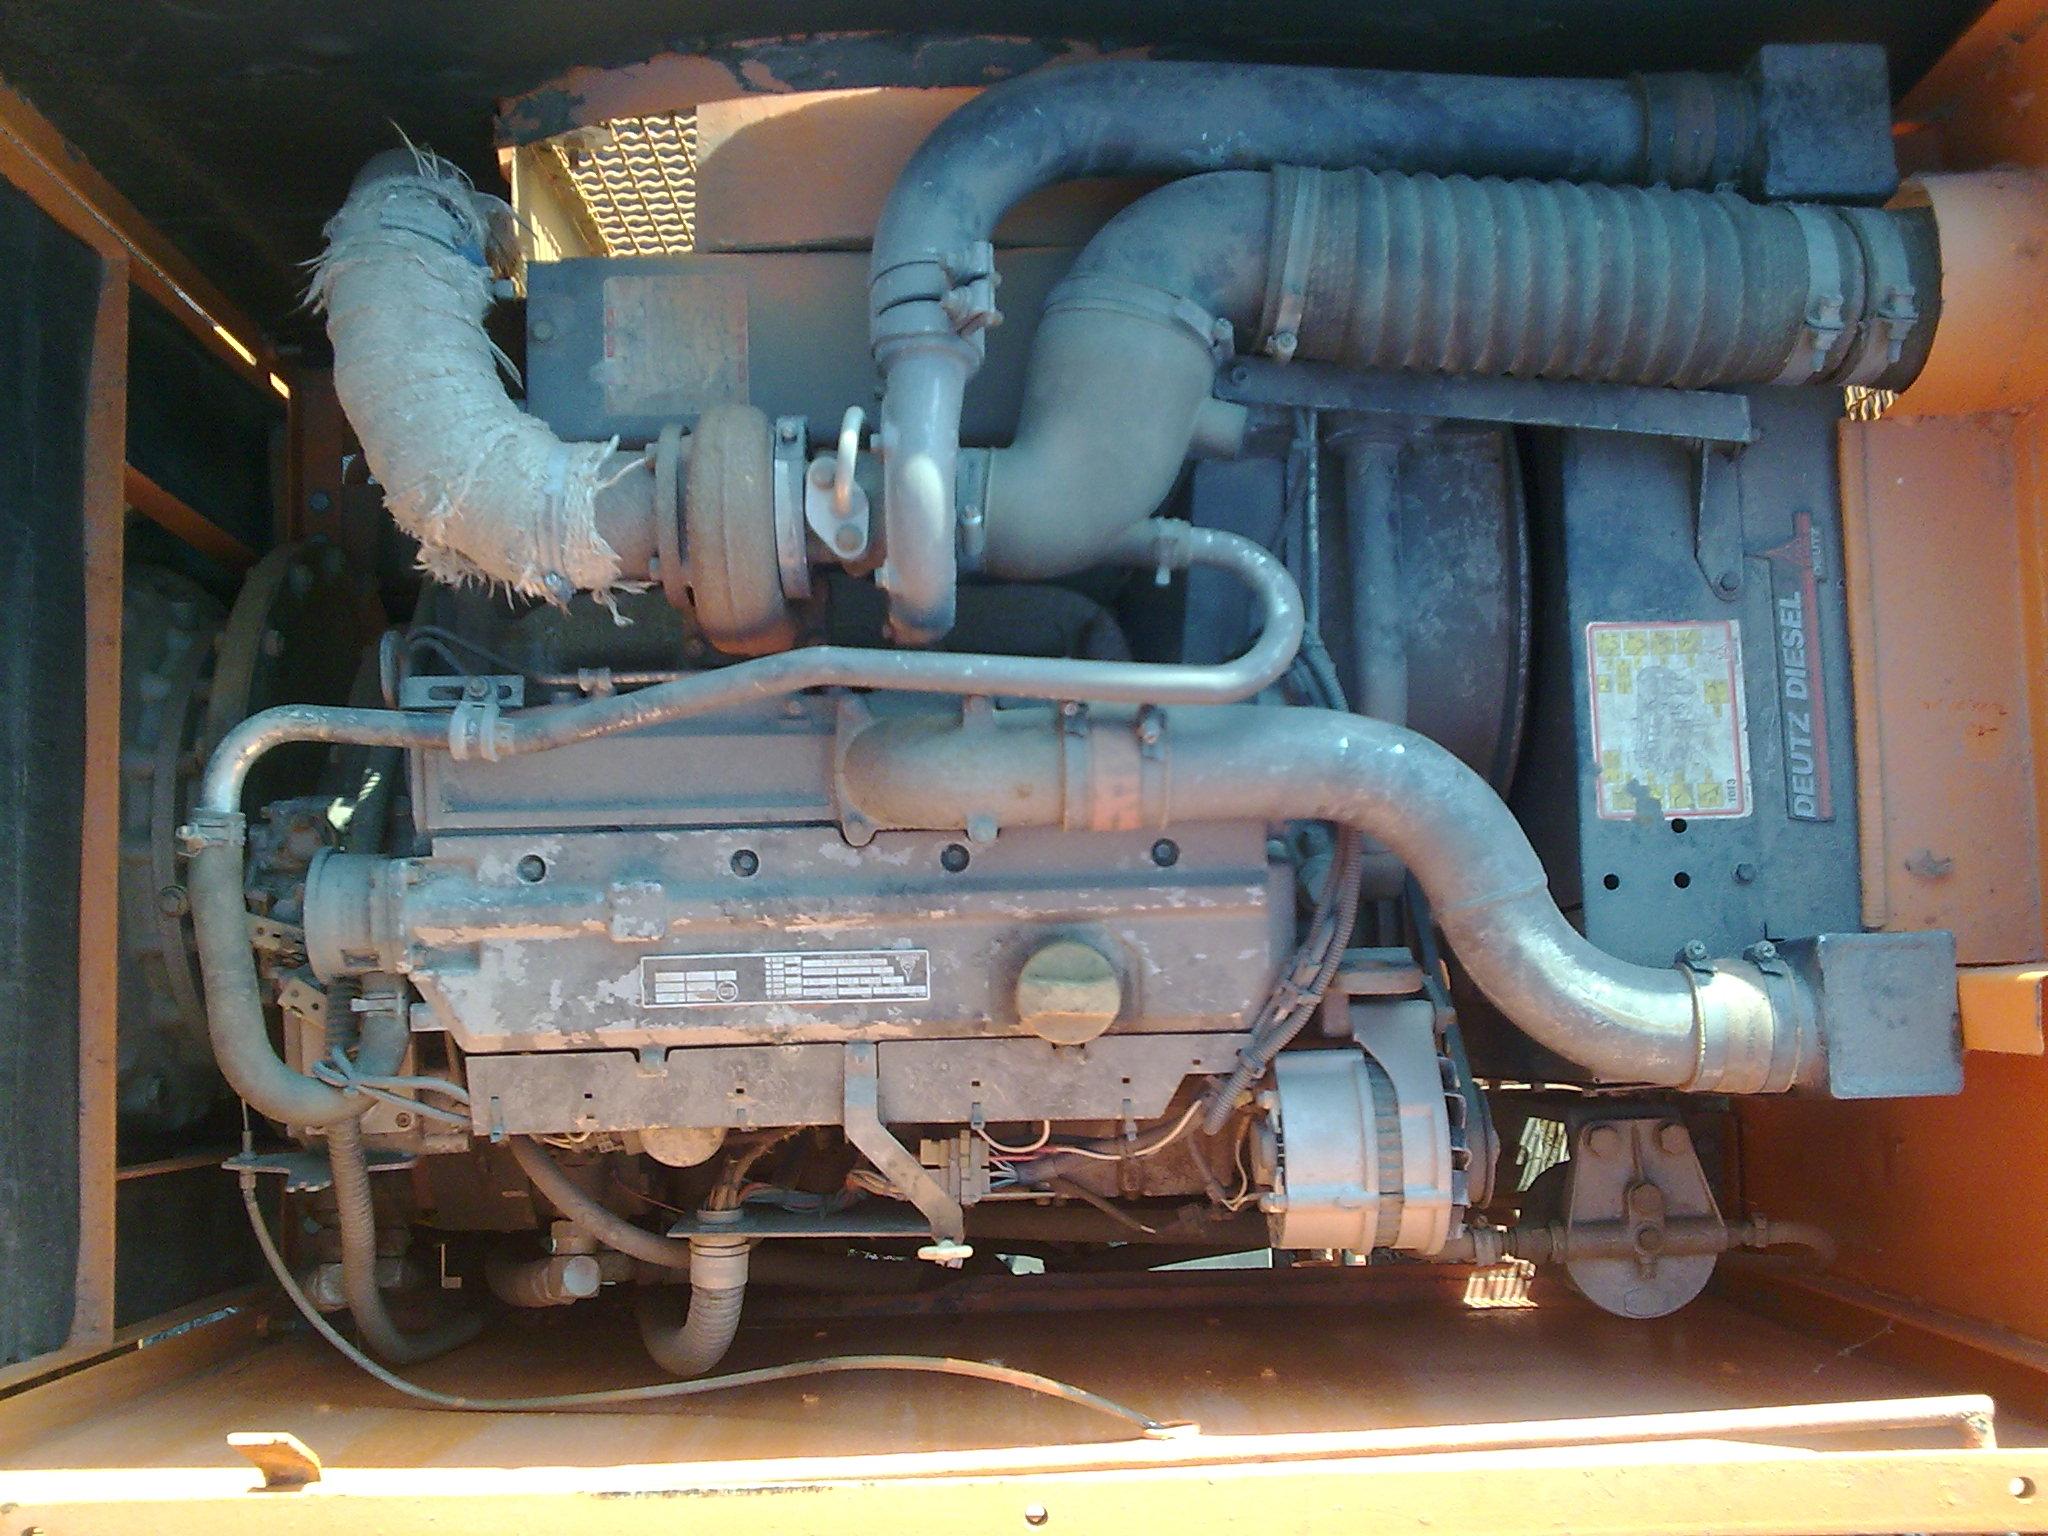 deutz-motor